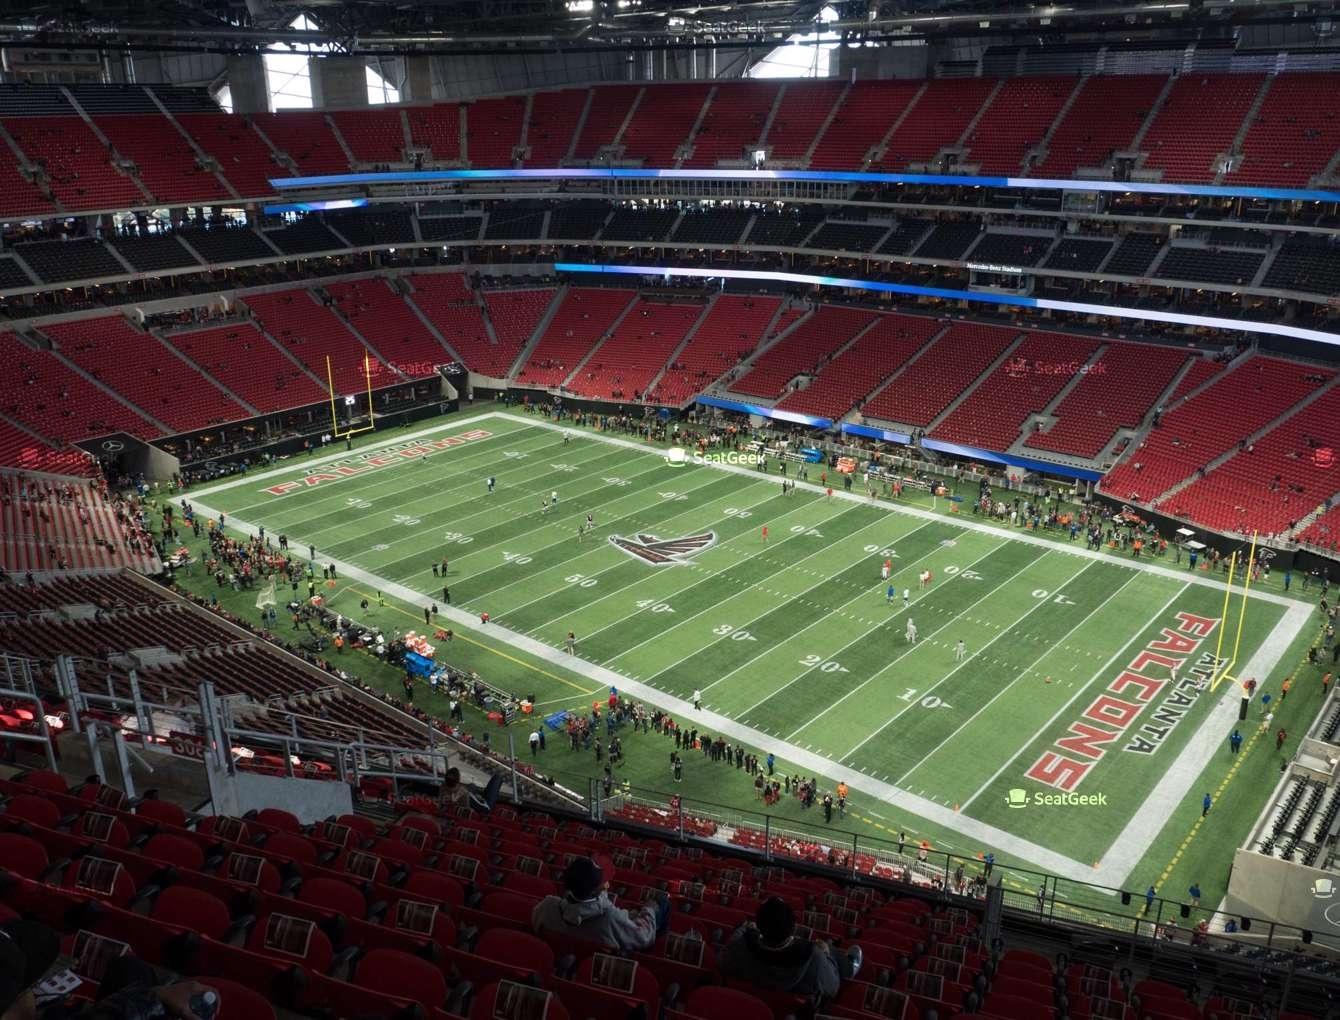 Mercedes-Benz Stadium Section 306 Seat Views | Seatgeek within Super Bowl Seating Chart Atlanta